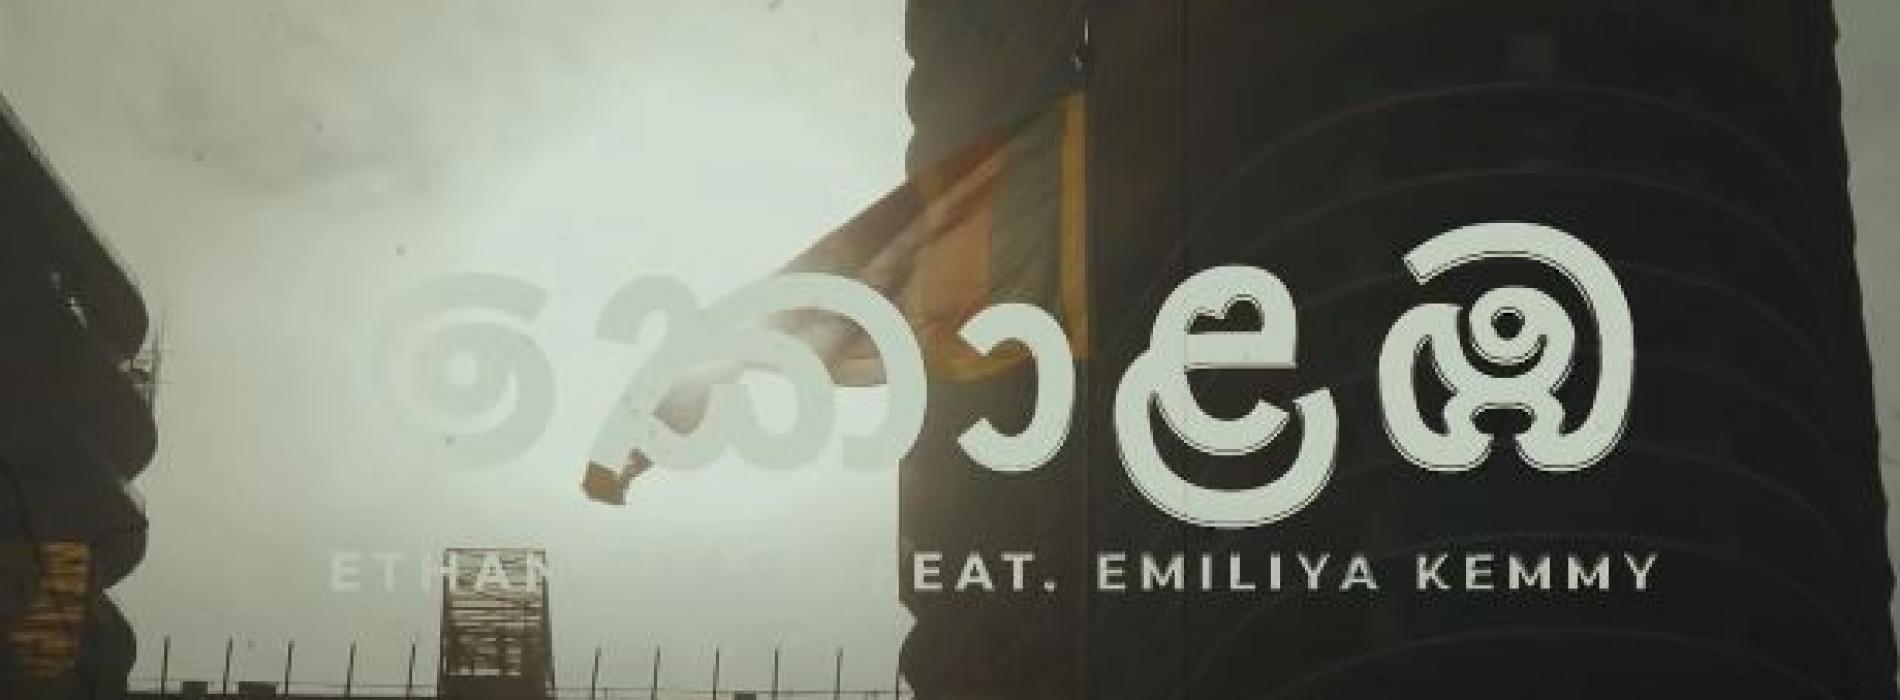 New Music : Ethan Clark Ft Emiliya Kemmy – COLOMBO [කොළඹ] (Official Music Video)